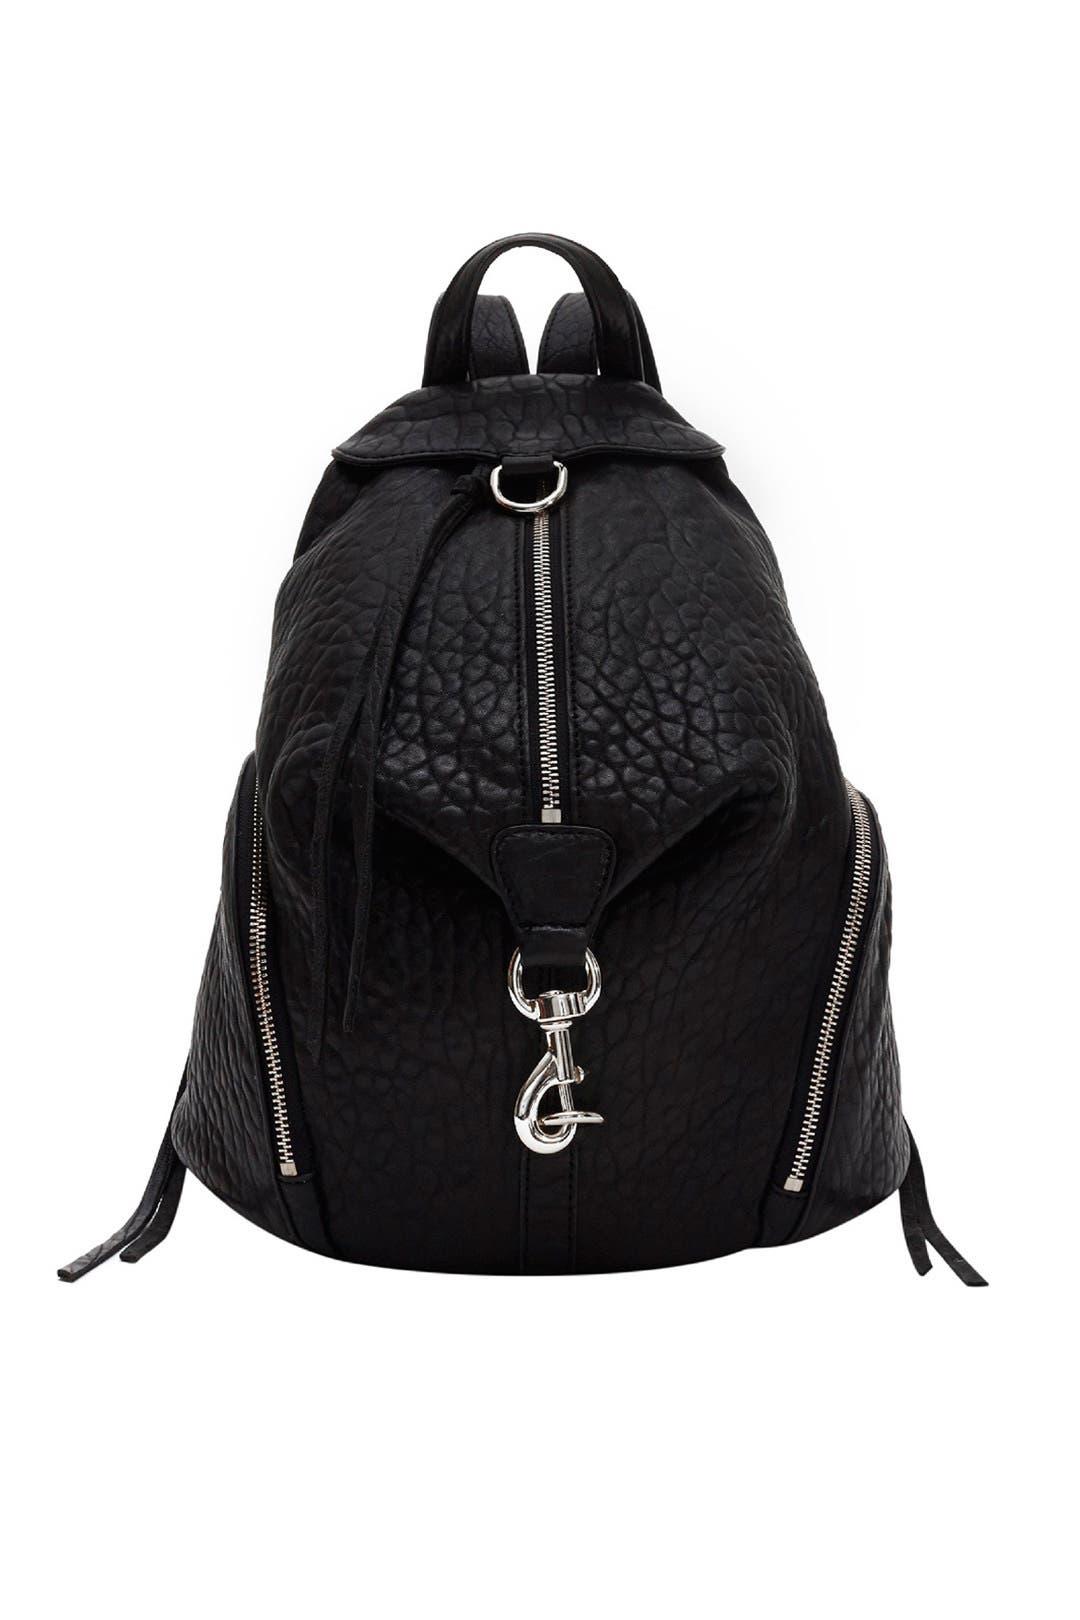 Black Julian Backpack by Rebecca Minkoff Handbags